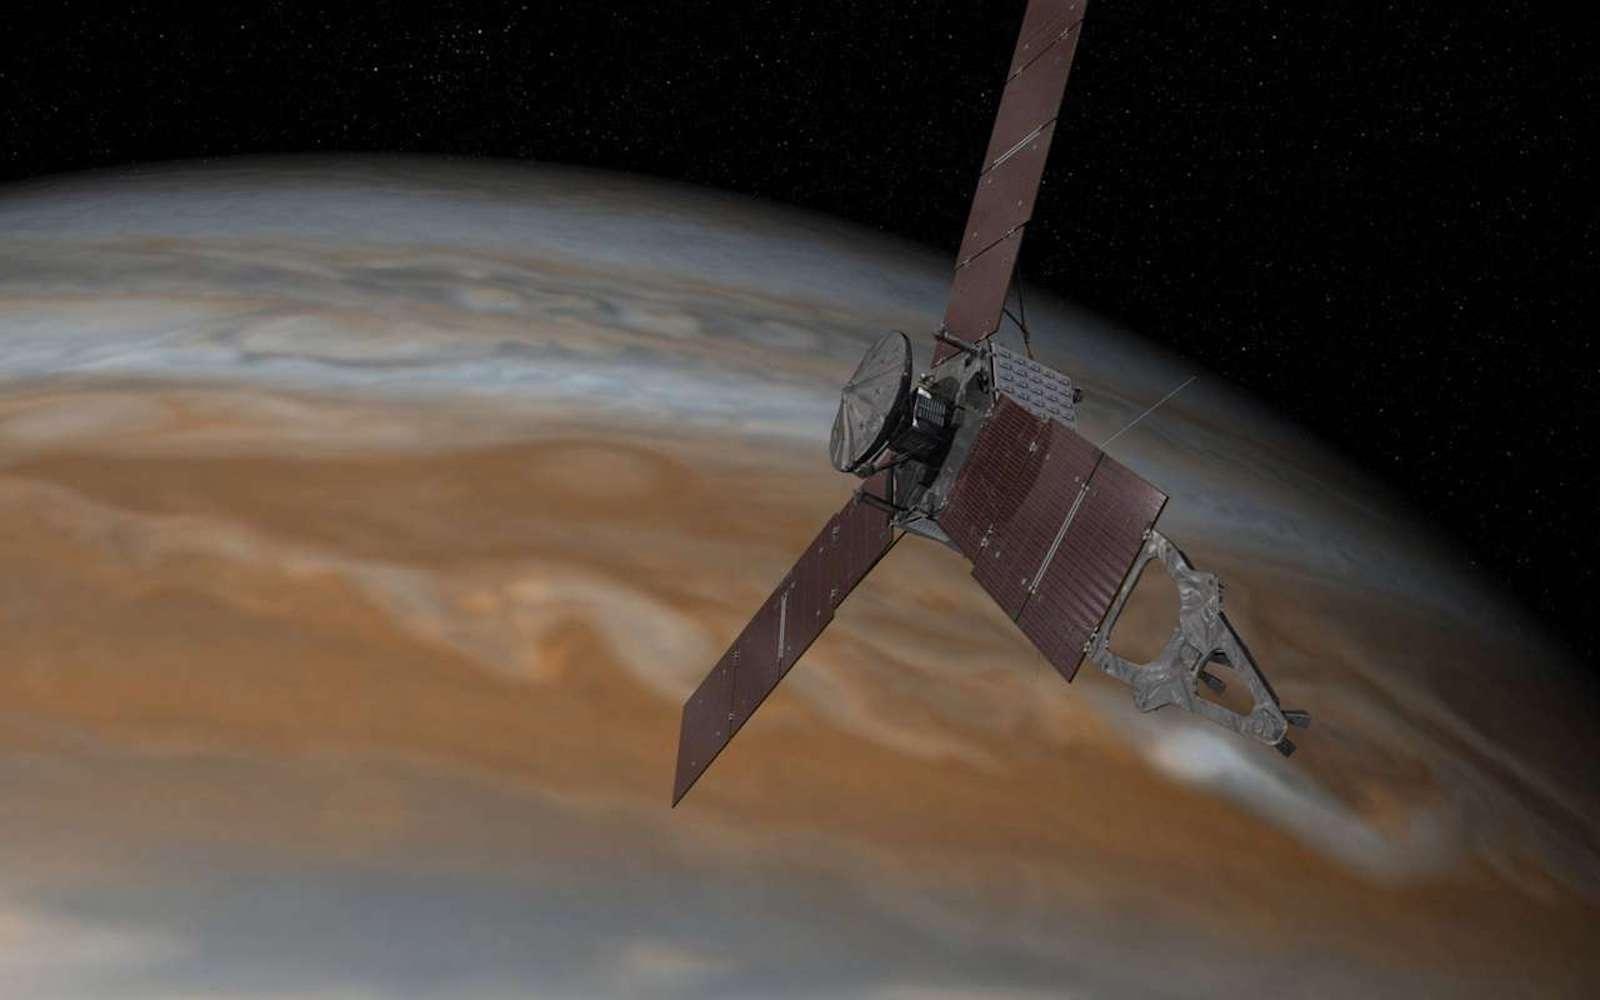 La sonde Juno étudie la planète Jupiter. © NASA / JPL